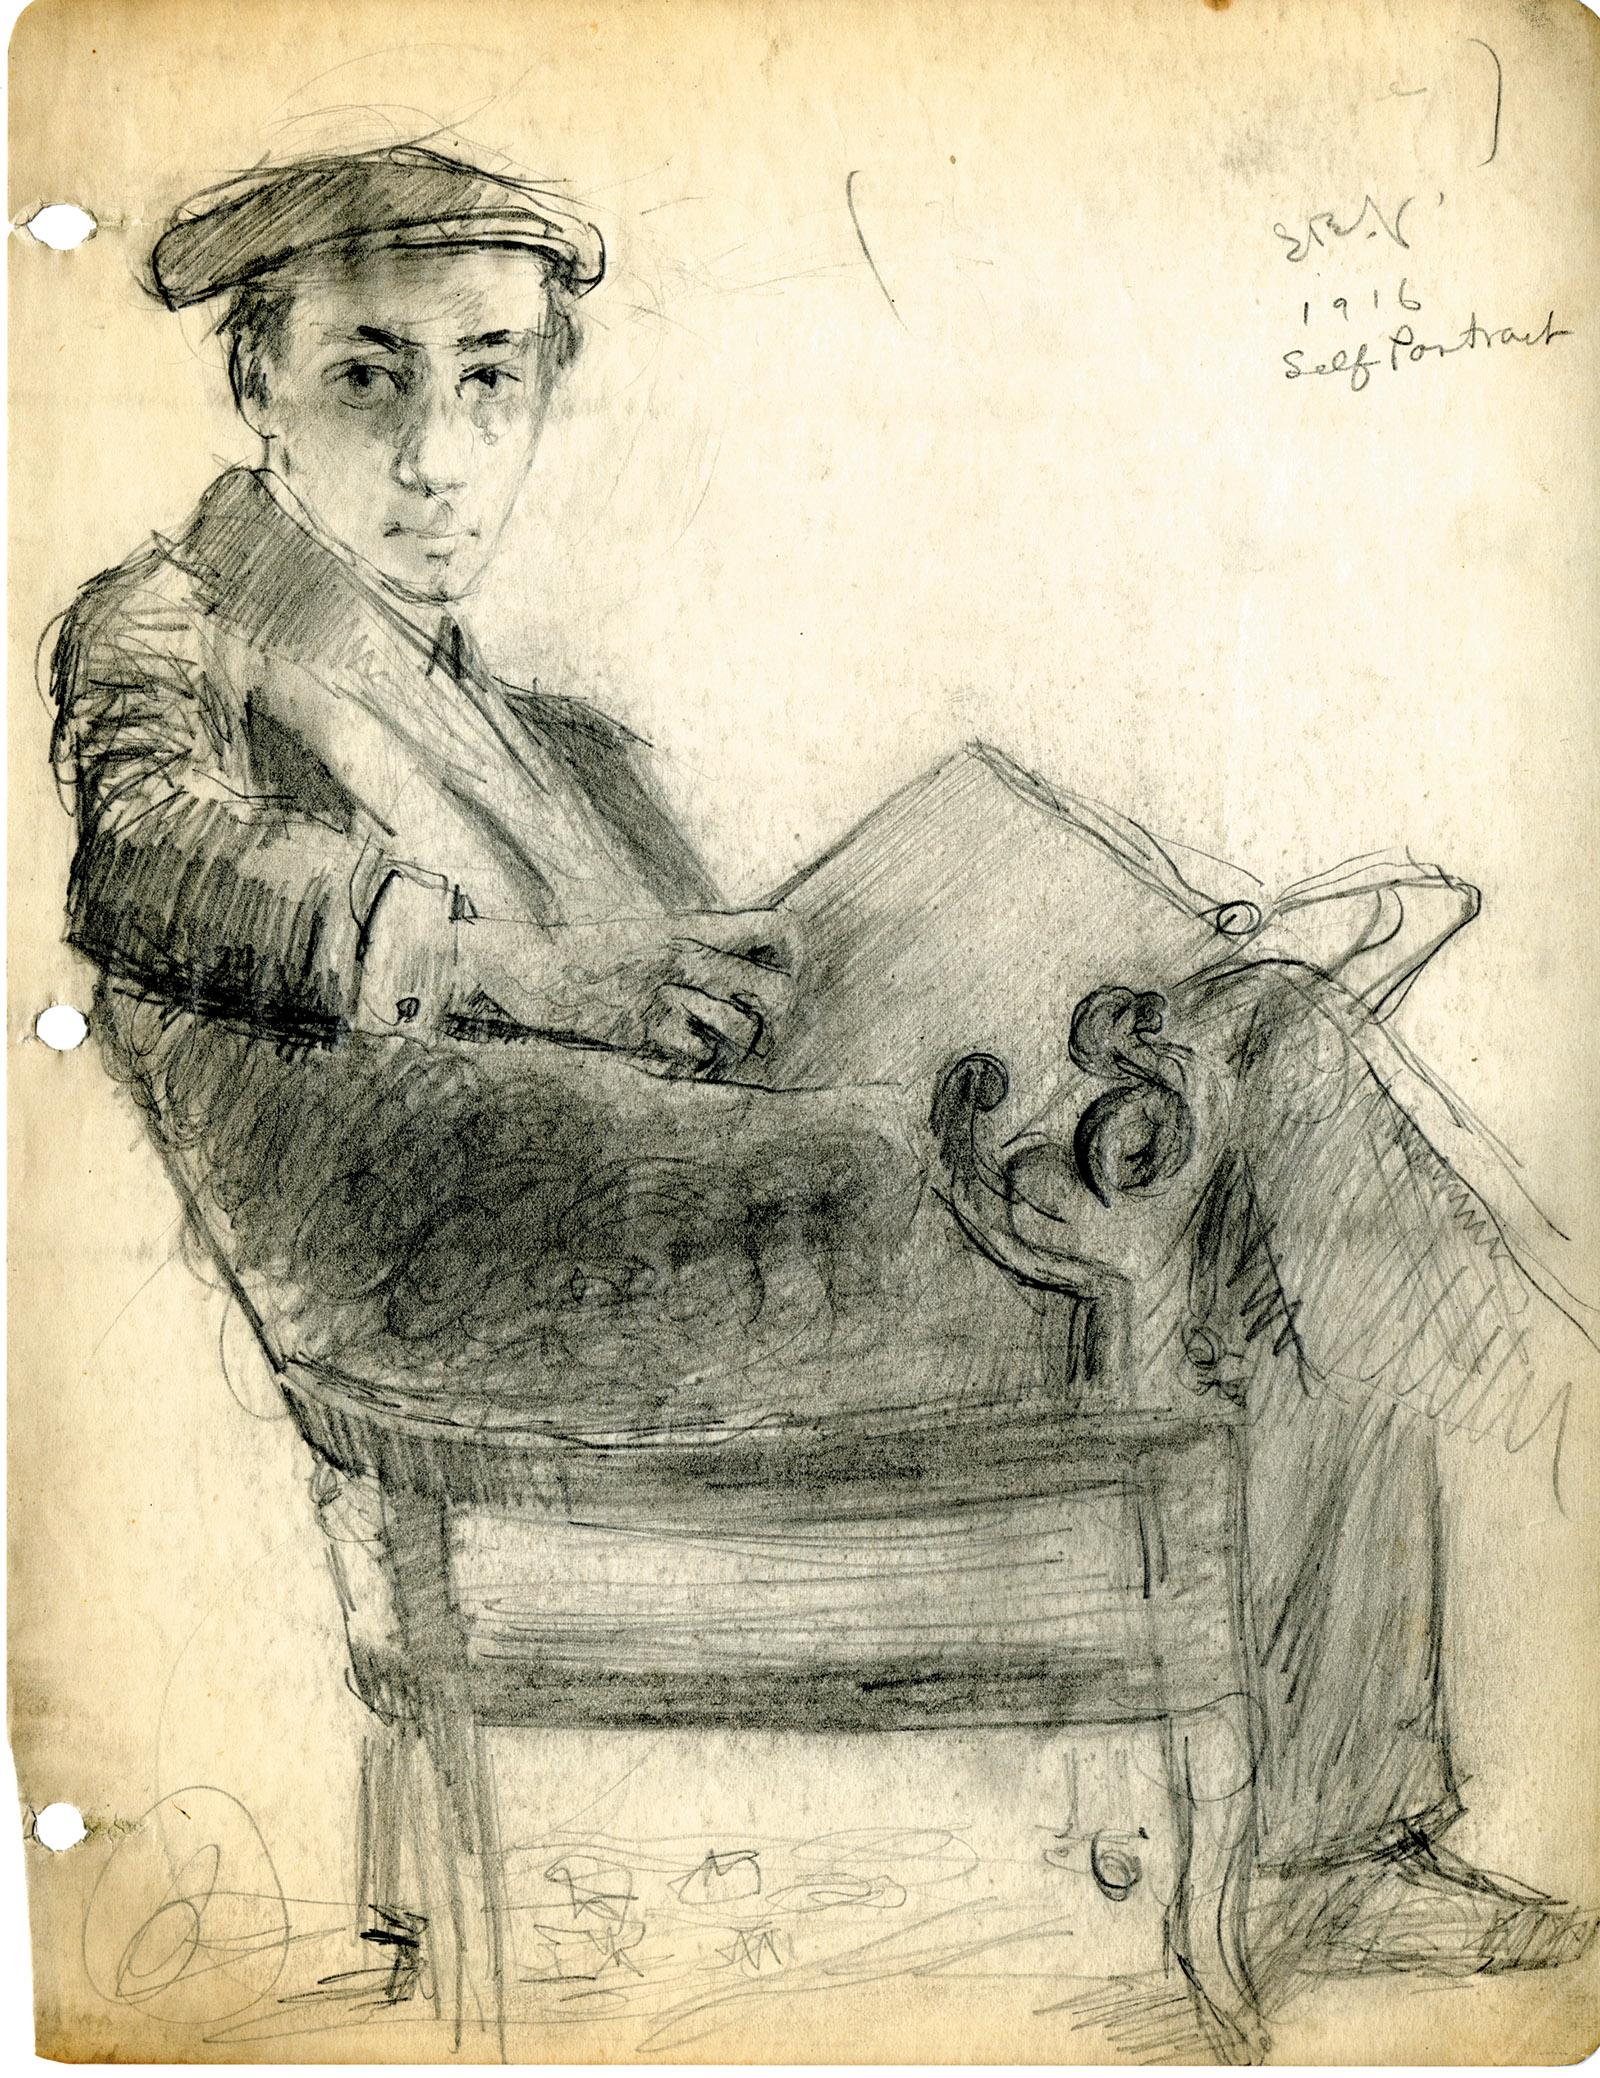 Self-portrait by Samuel Greenberg